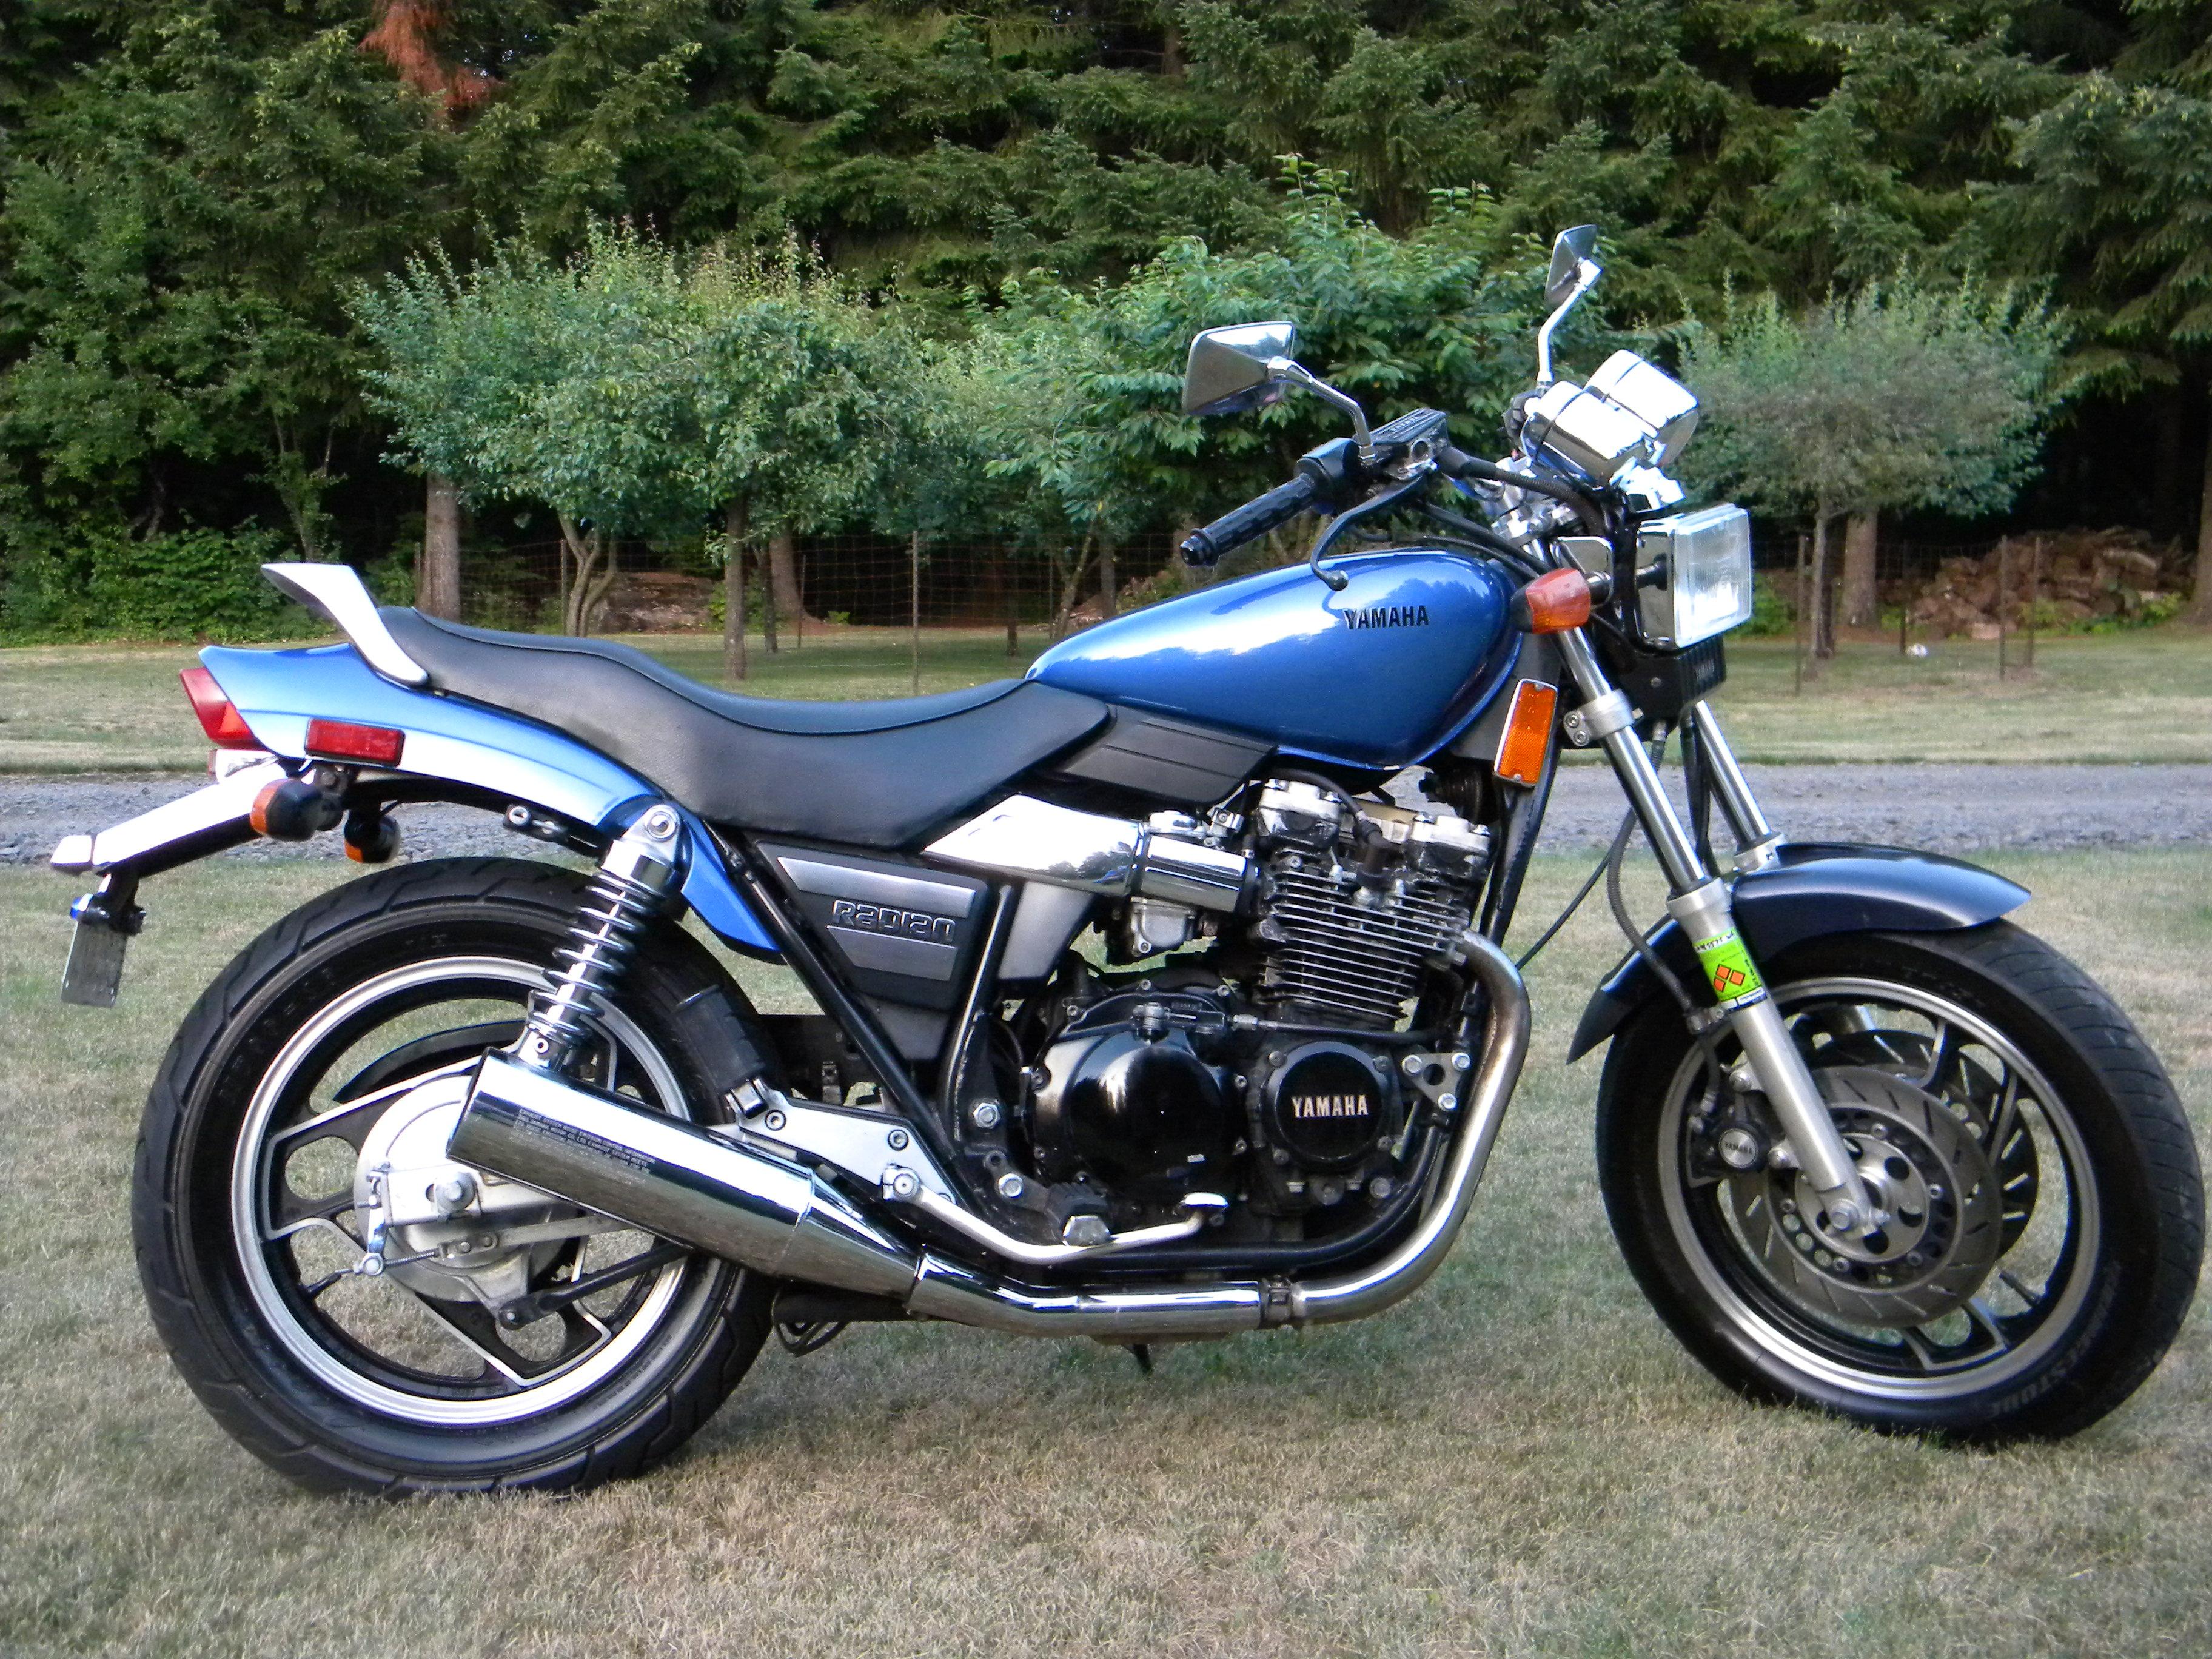 Yamaha YX600 Radian - Wikipedia